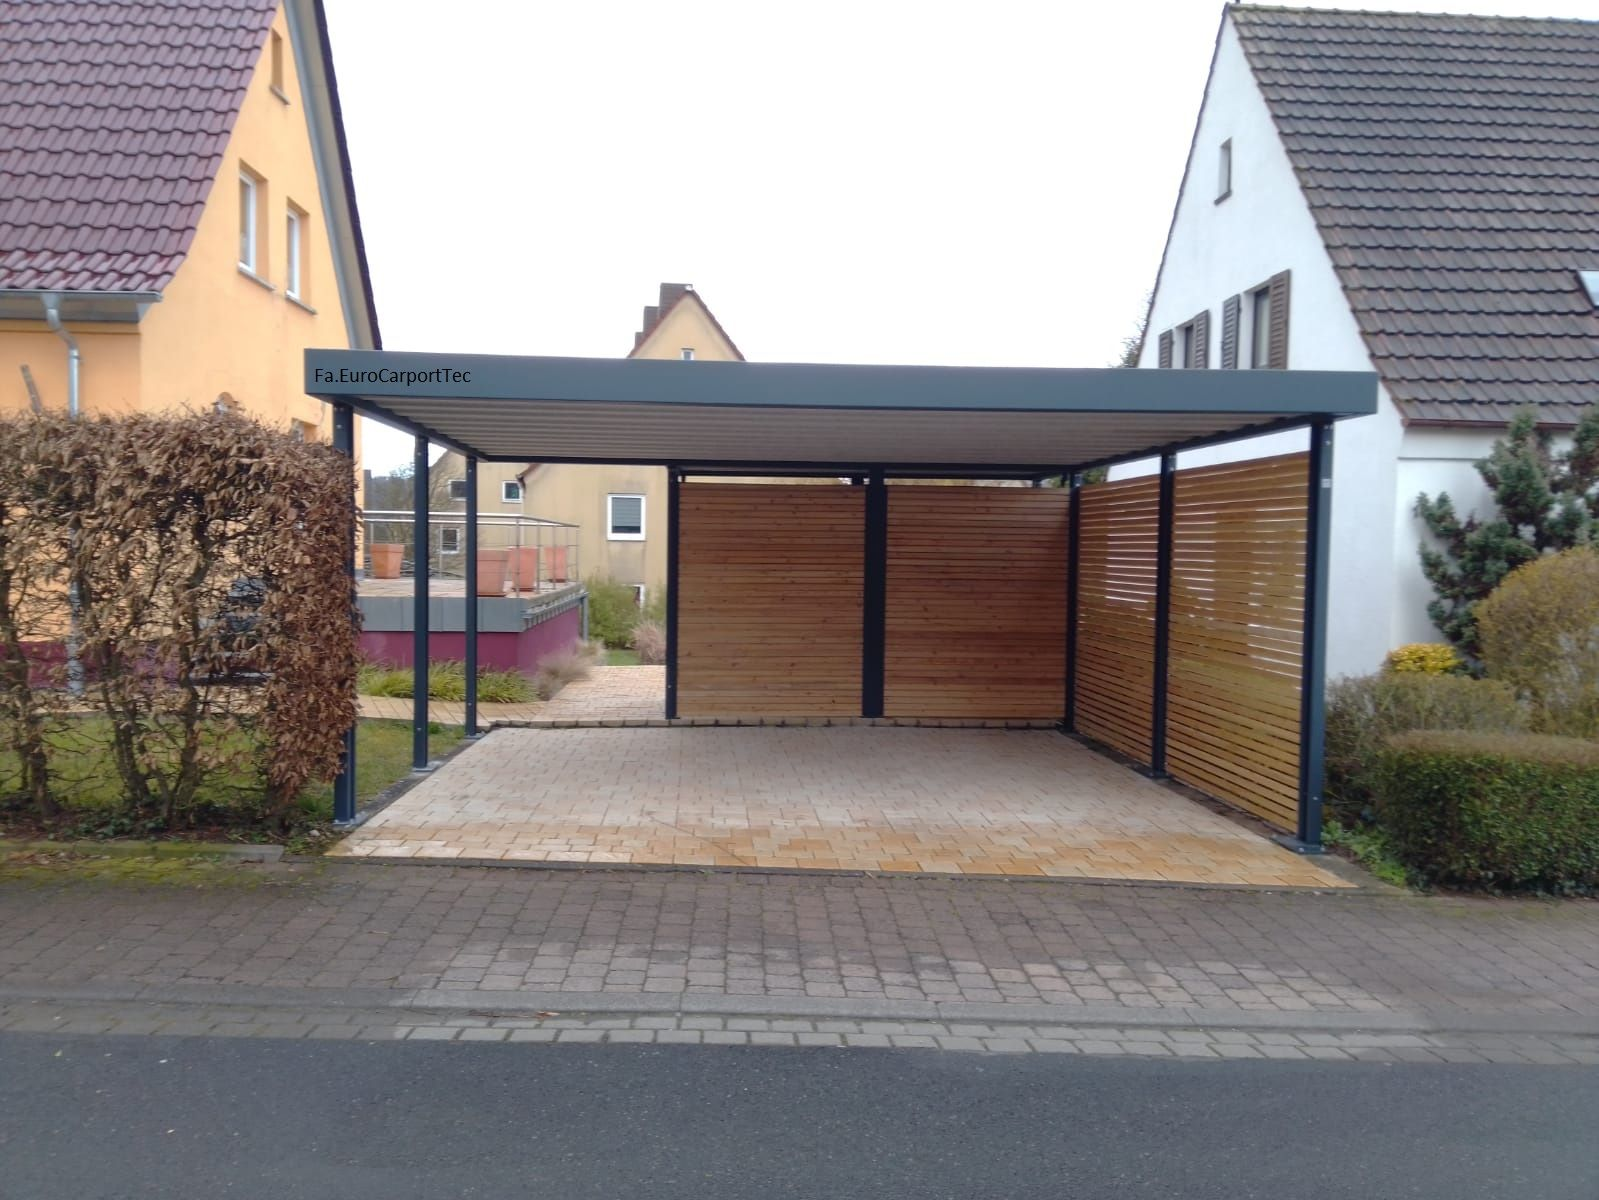 Metall Carport In 2020 Carport Metall Carport Haus Aussen